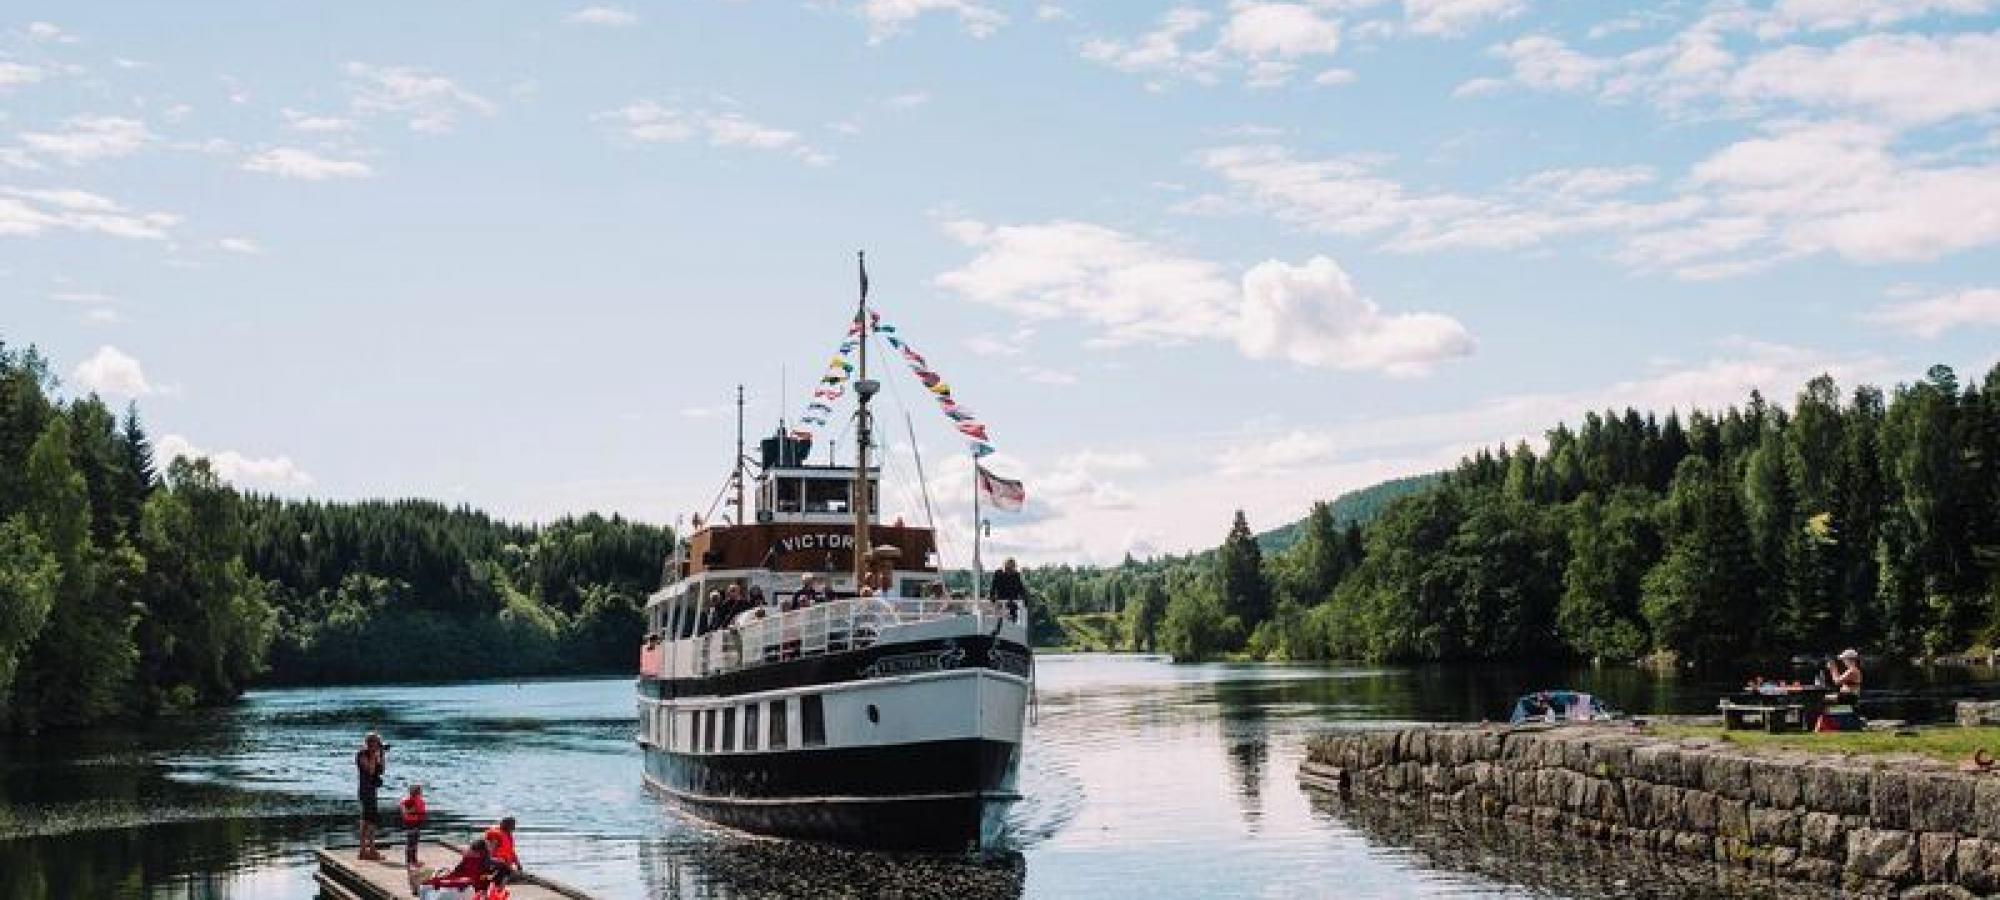 ulefoss dating single lærdalsøyri